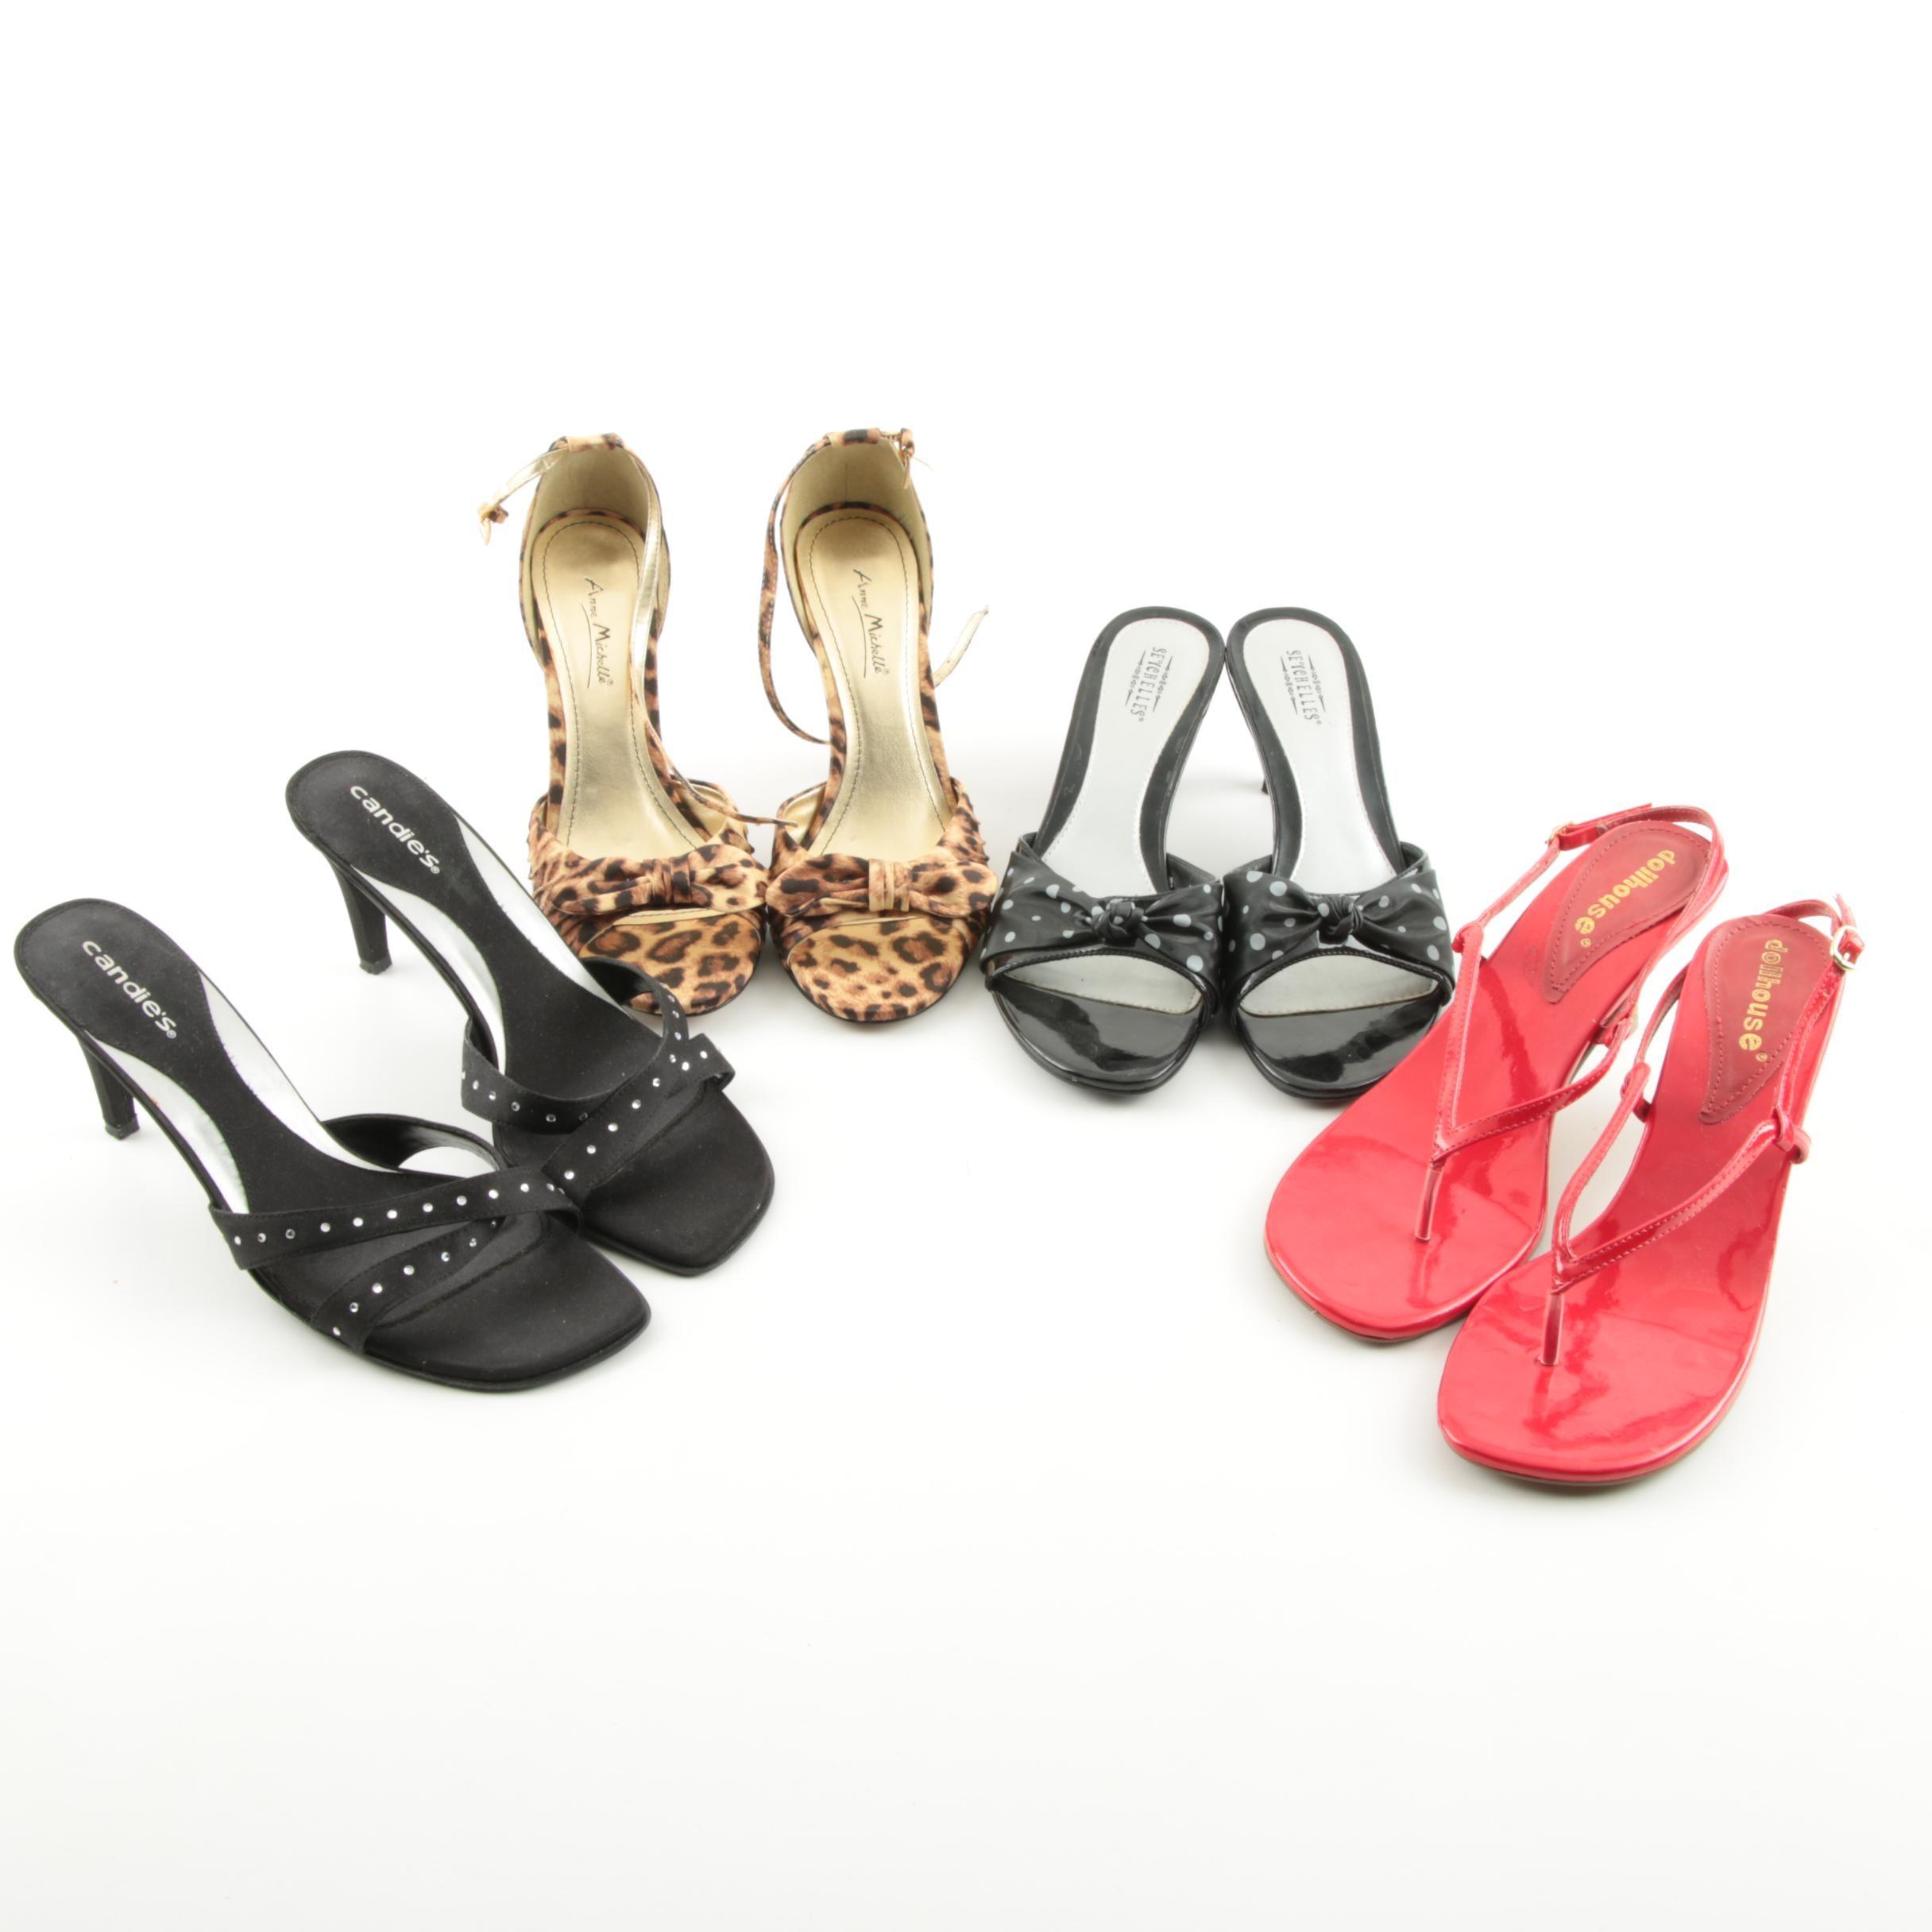 Women's Sandals Including Seychelles